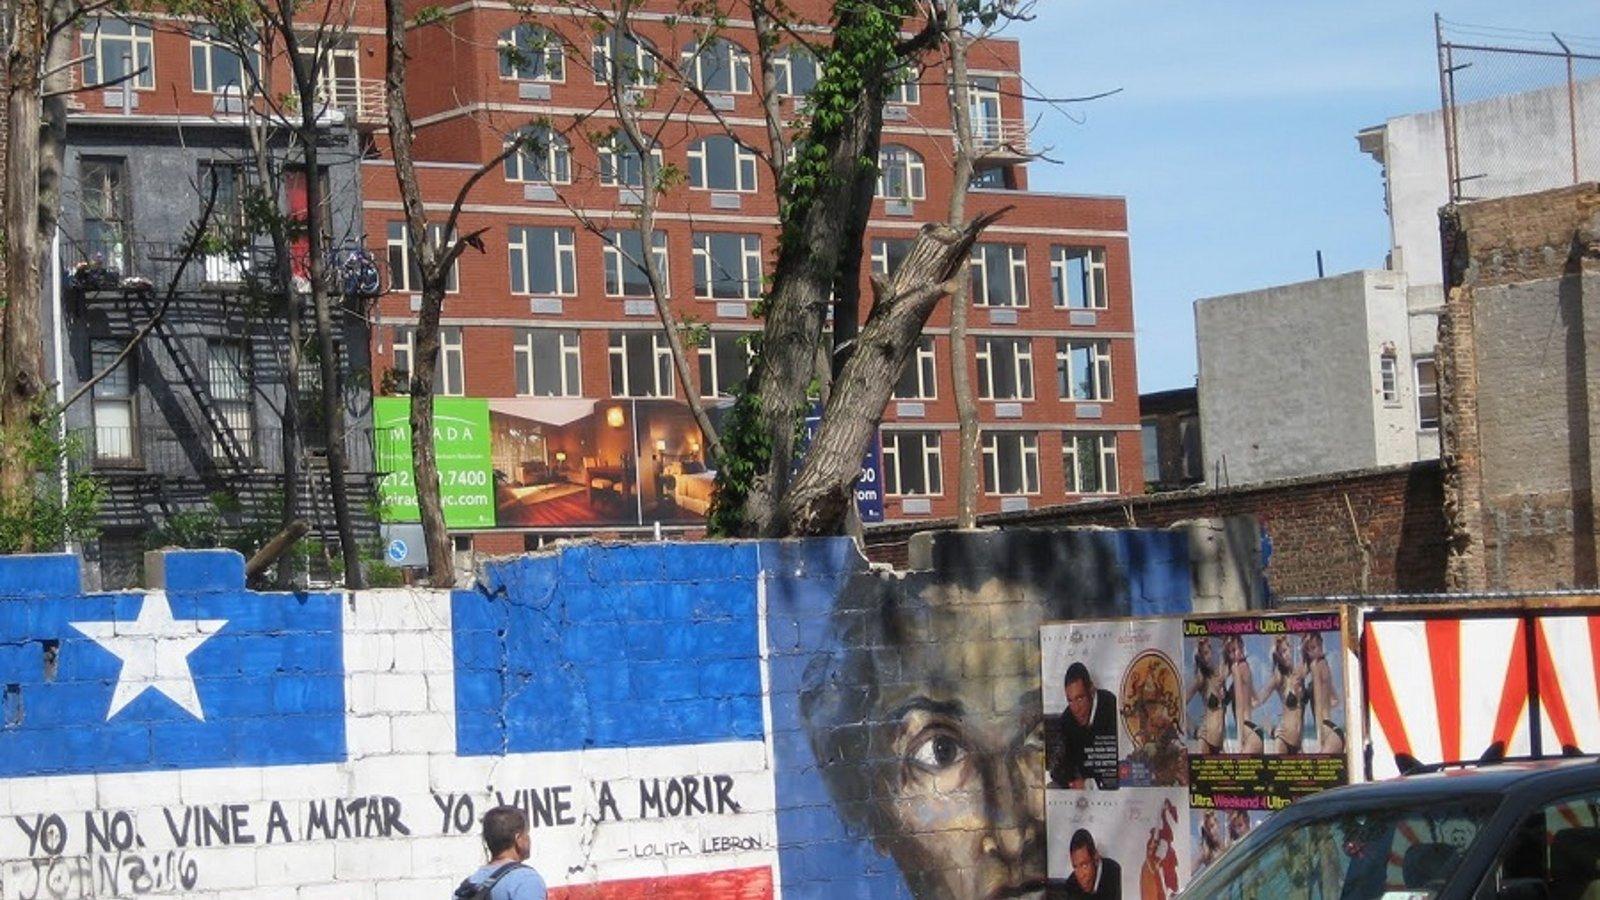 Whose Barrio? - The Gentrification of Spanish Harlem